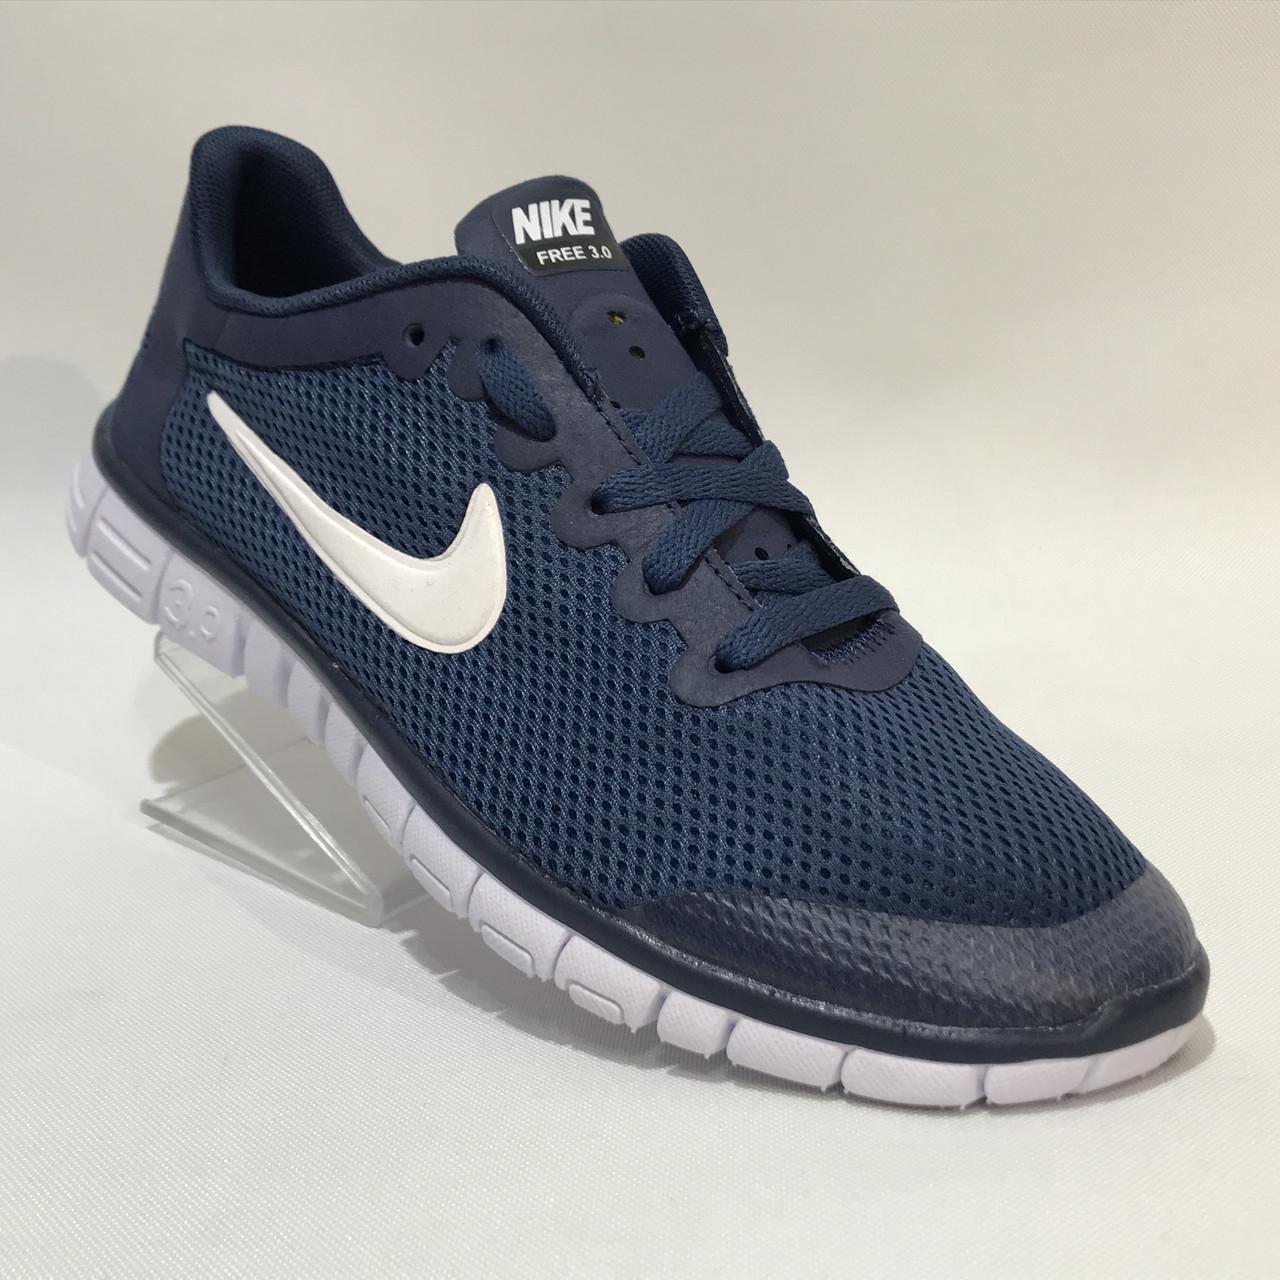 5d0d6d46 Кроссовки мужские Nike Free Run 3.0 сетка синие (найк фри ран) - Мужская  спортивная